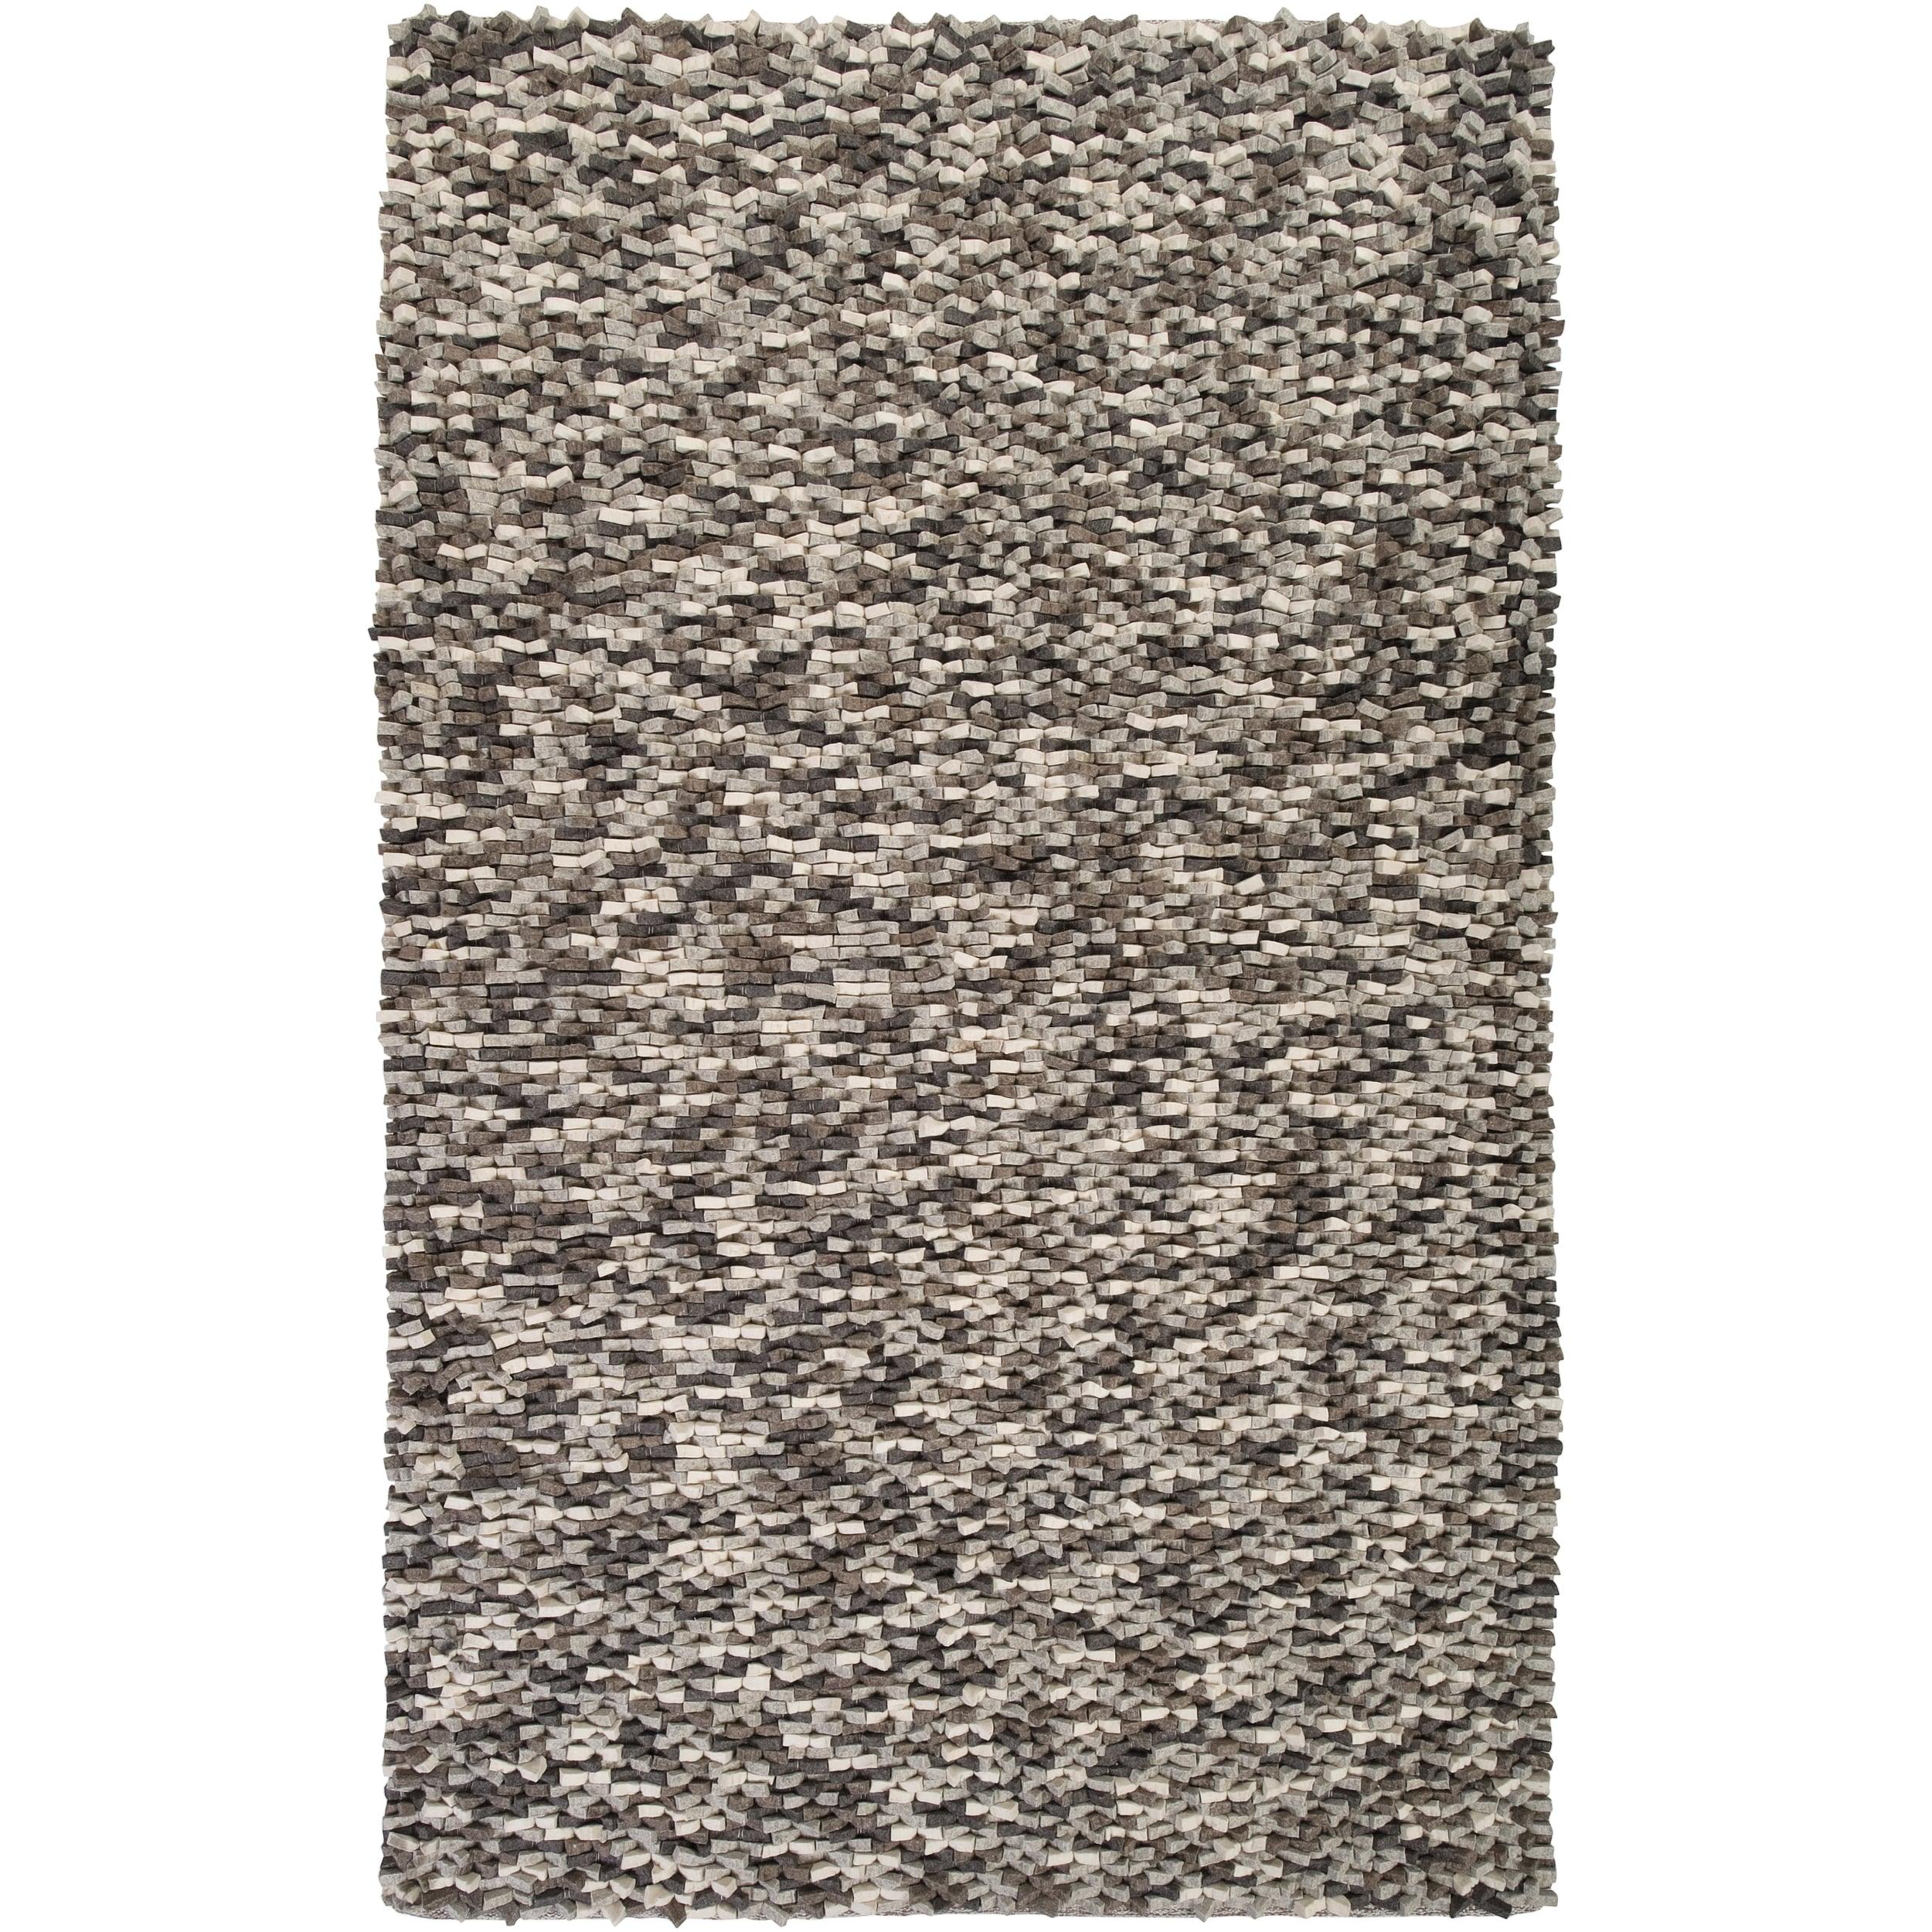 Hand-woven Blackpool New Zealand Wool Plush Textured Area Rug - 8' x 10'